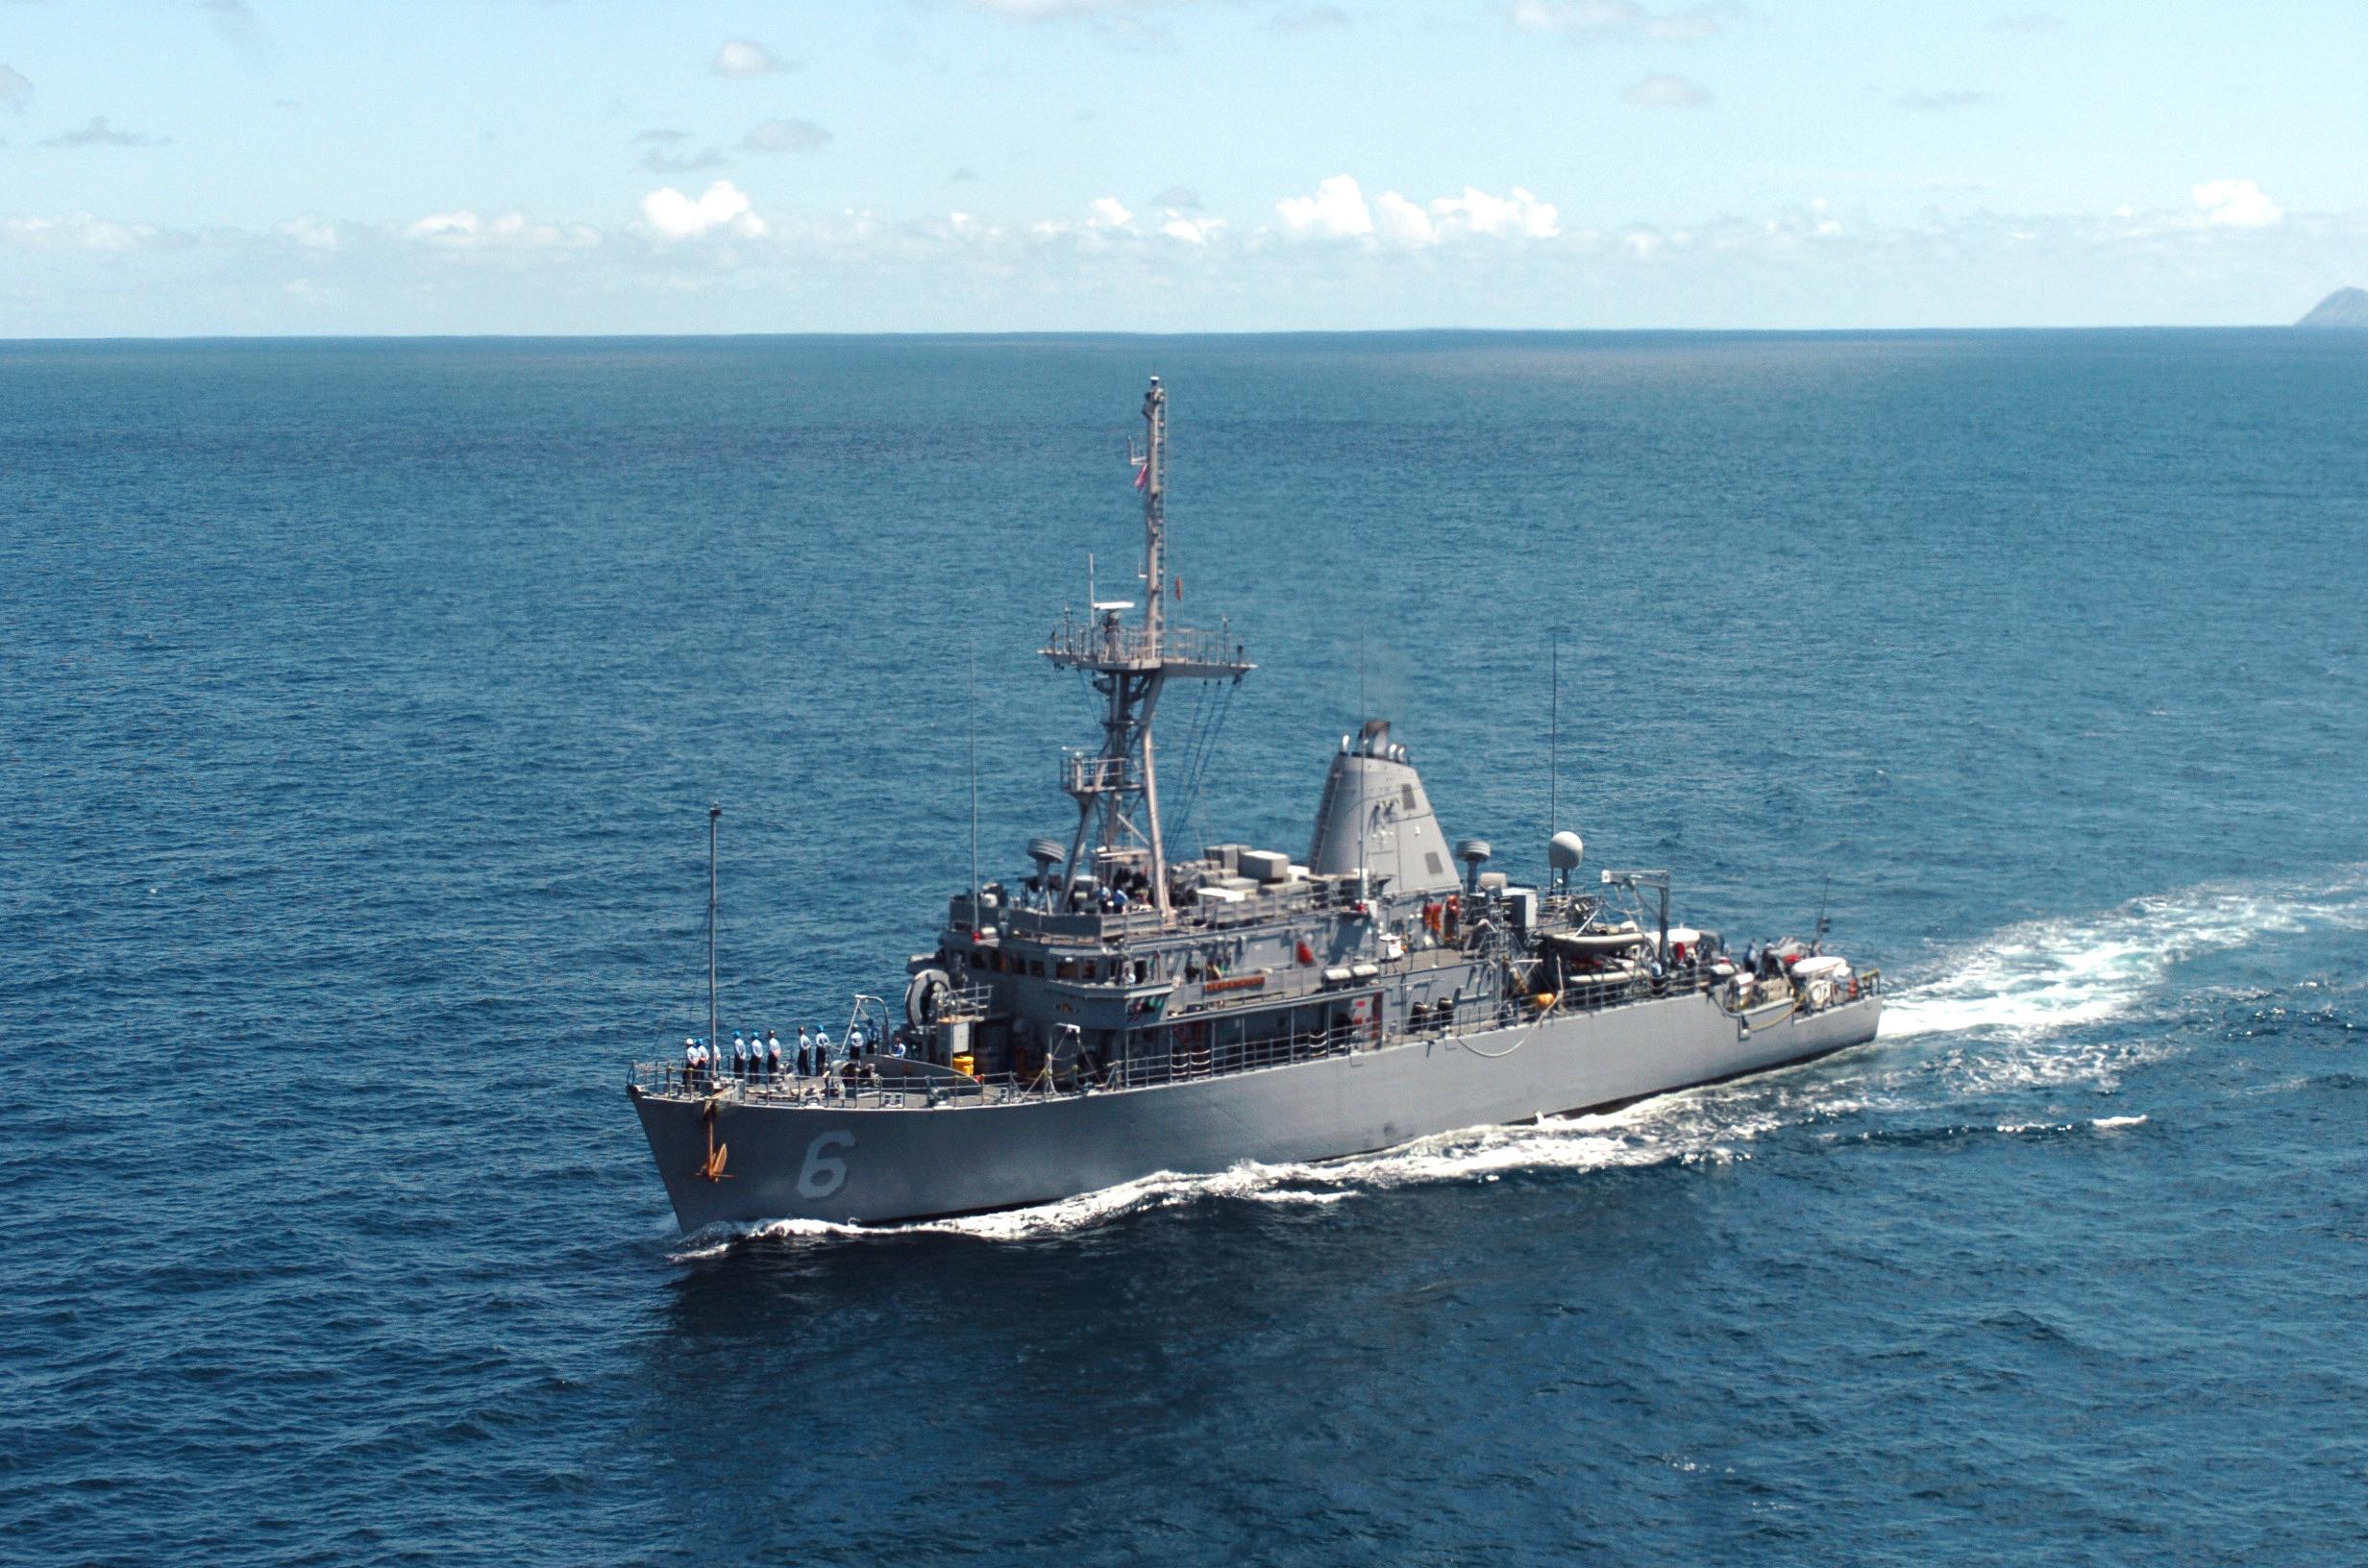 File:USS Devastator MCM-6.jpg - Wikimedia Commons